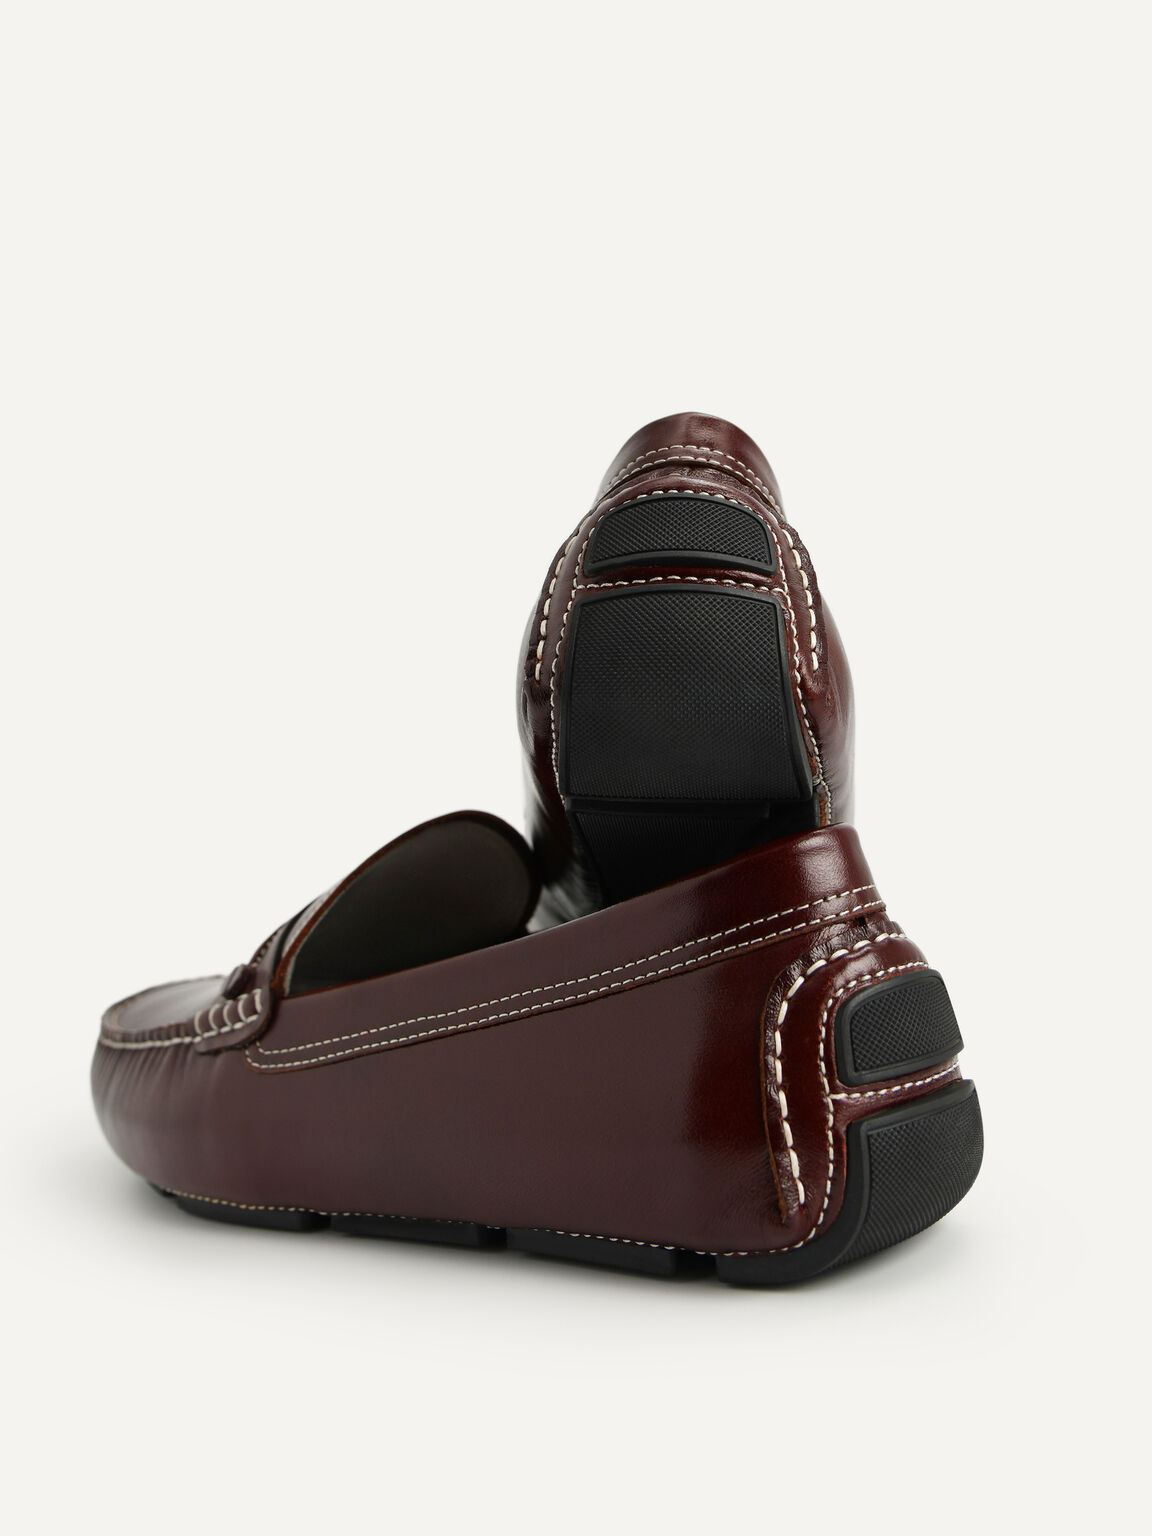 Leather Moccasins, Mahogany, hi-res